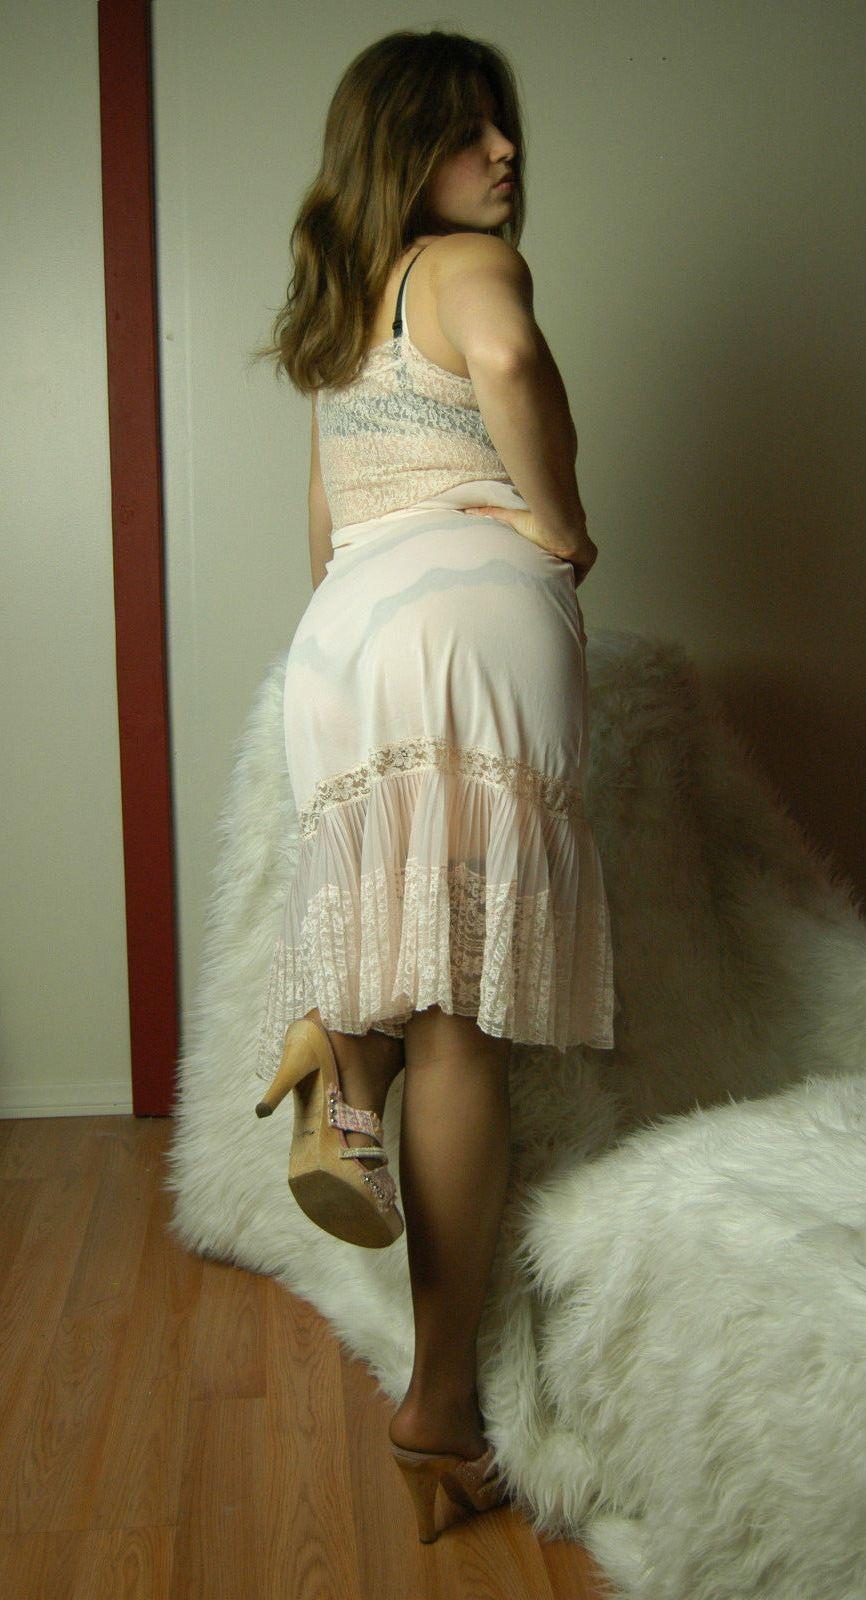 van raalte beautiful lace slip | slips, chemises & nightgowns